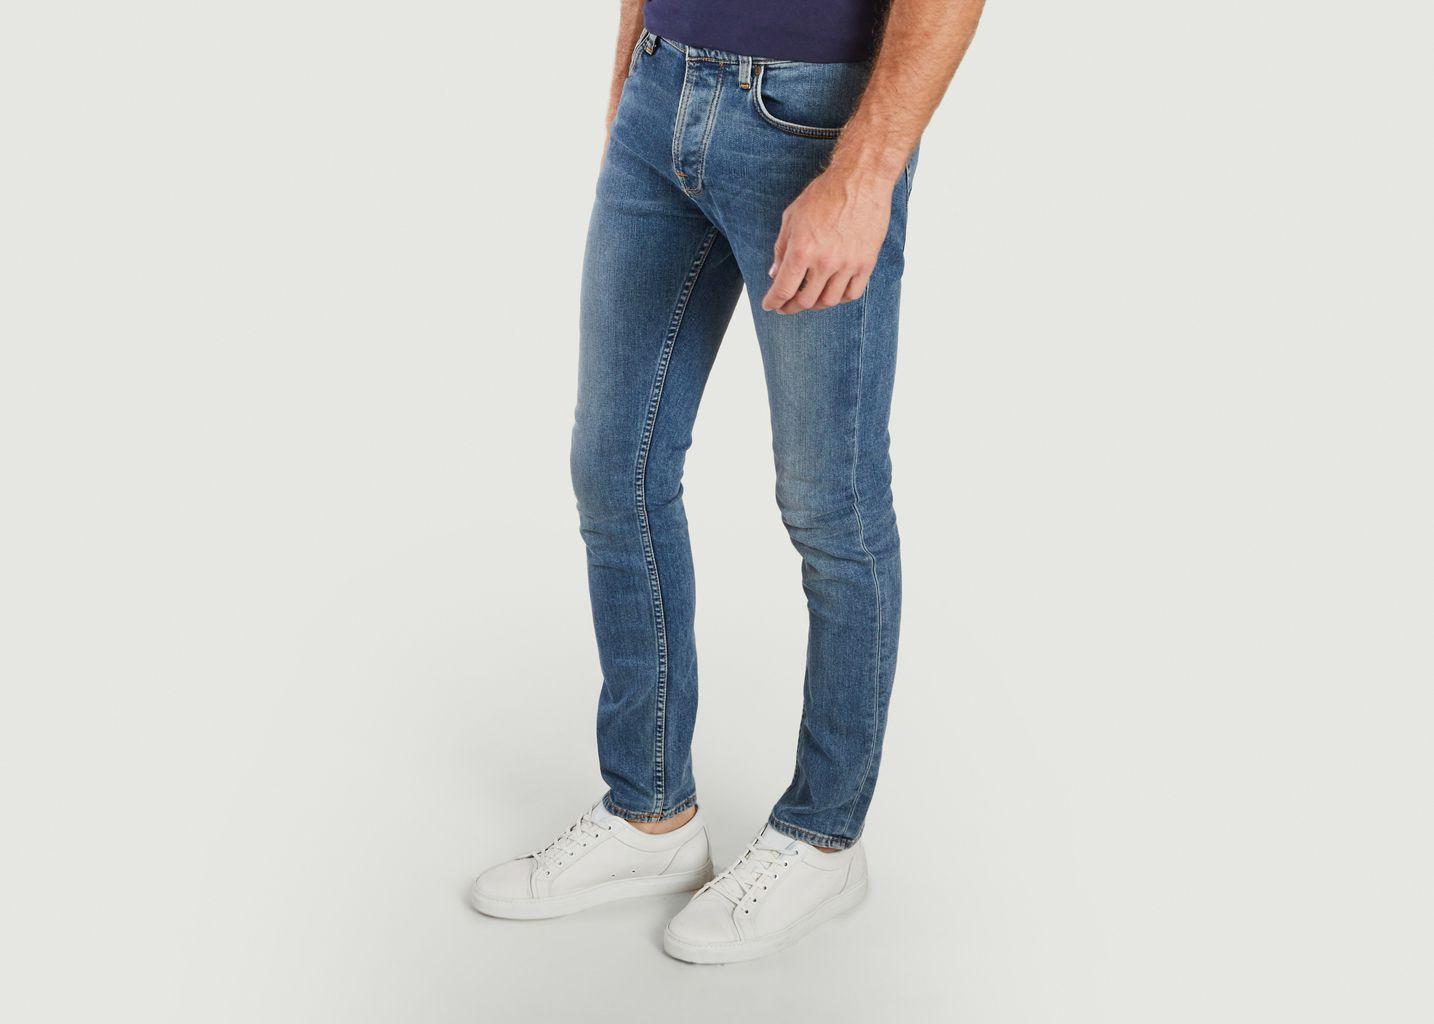 Jean Grim Tim Ojai Blues - Nudie Jeans